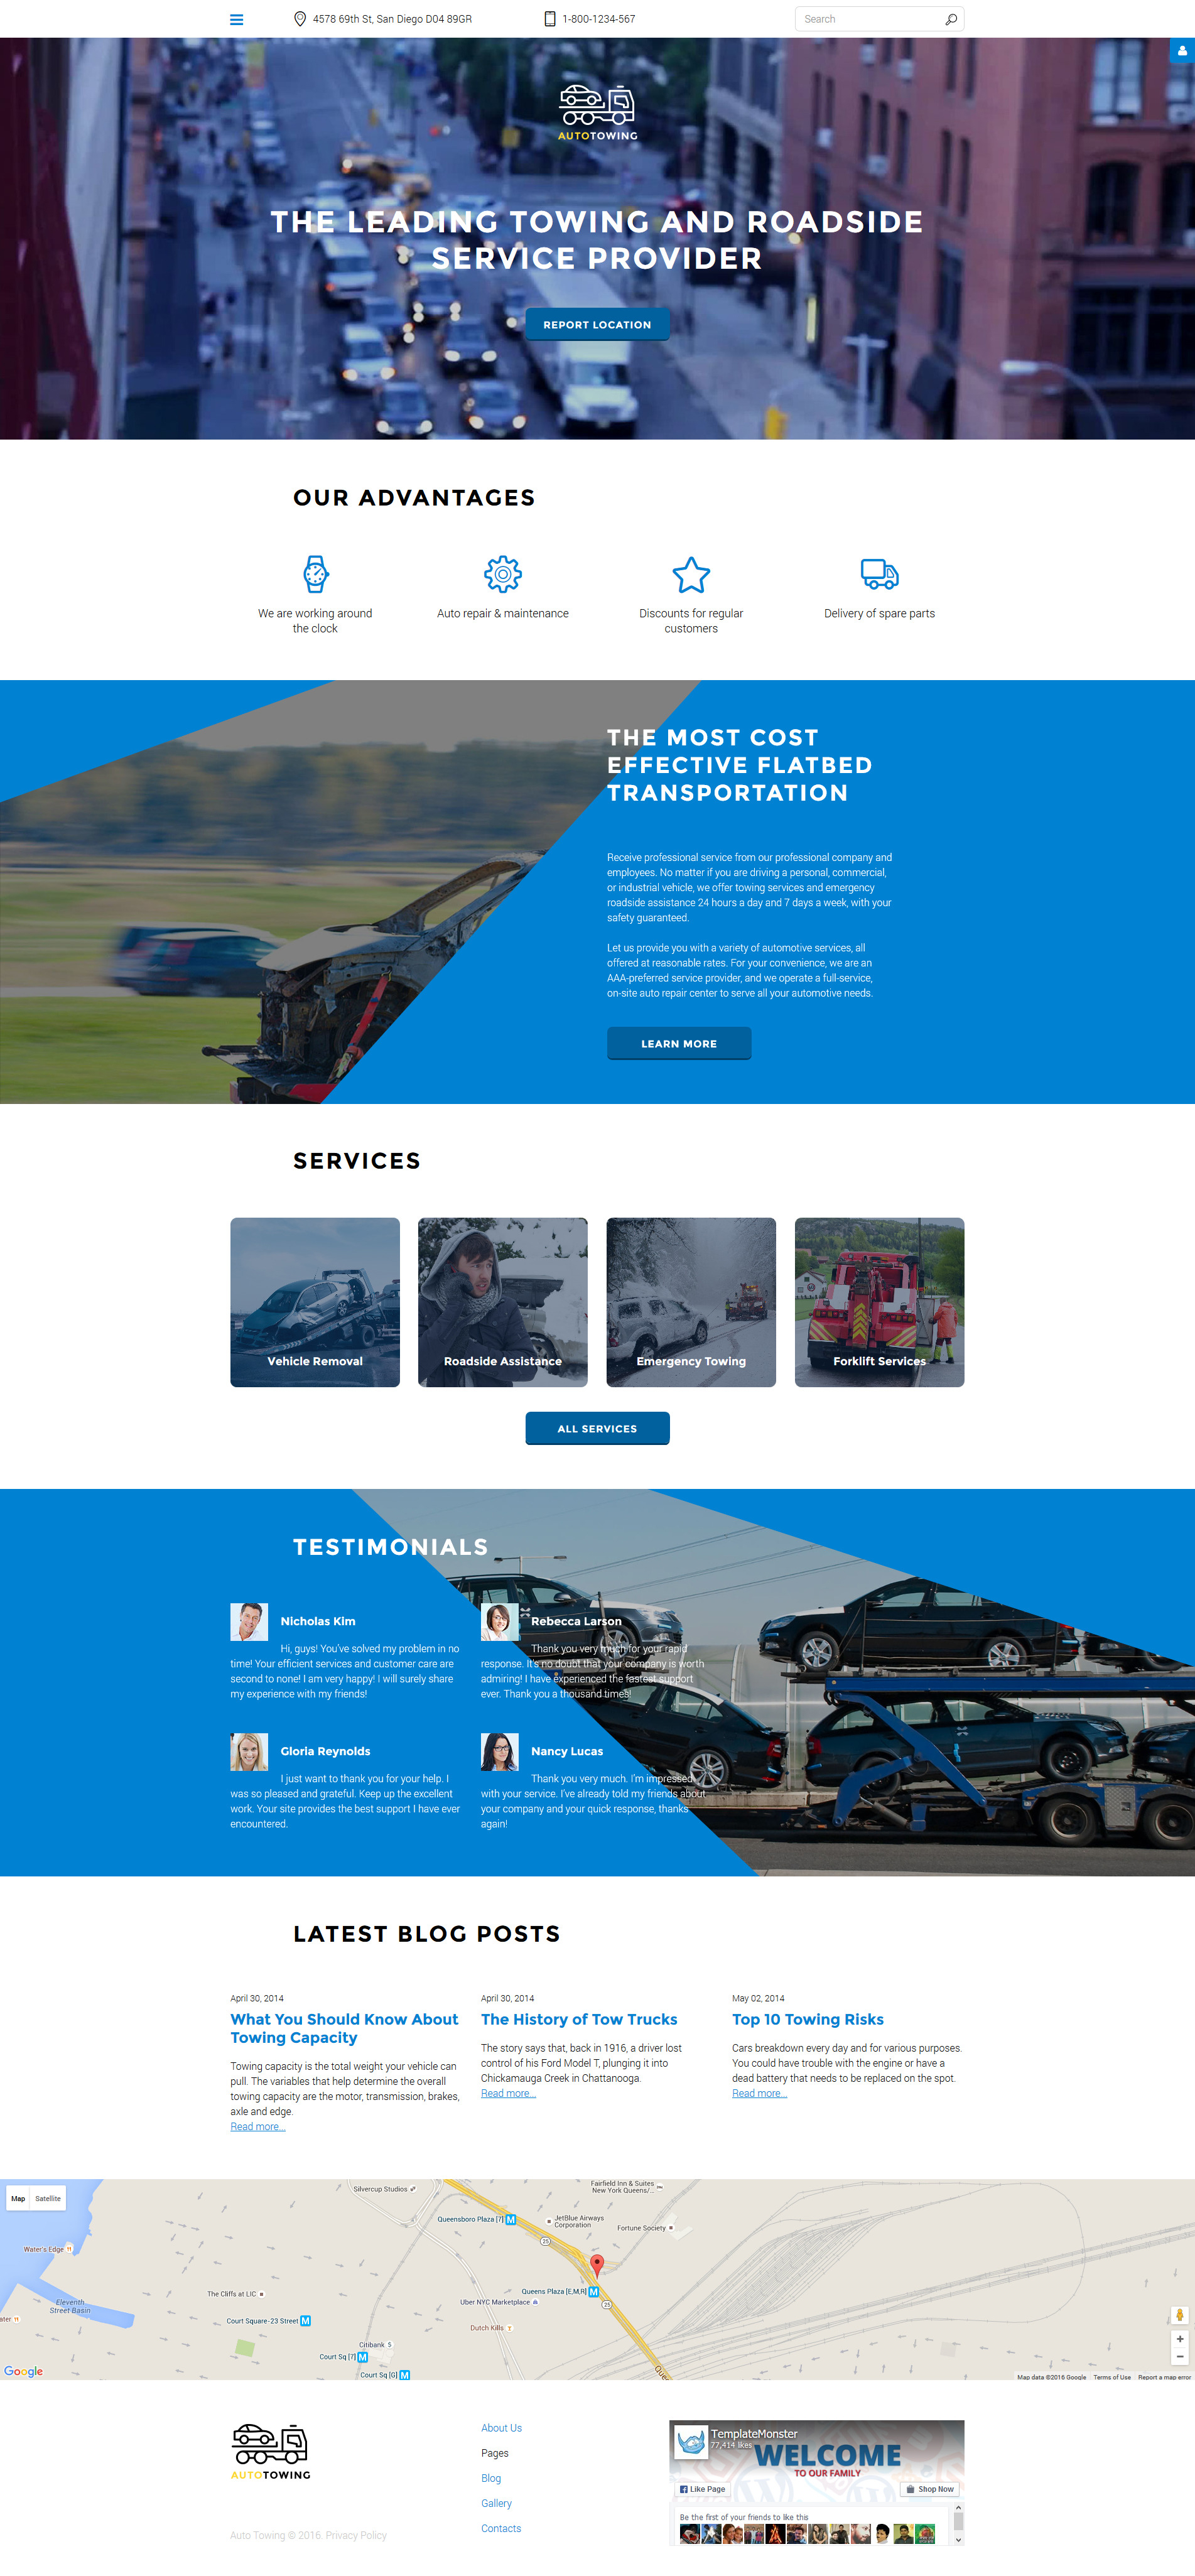 Адаптивный Joomla шаблон №58172 на тему буксировка авто - скриншот